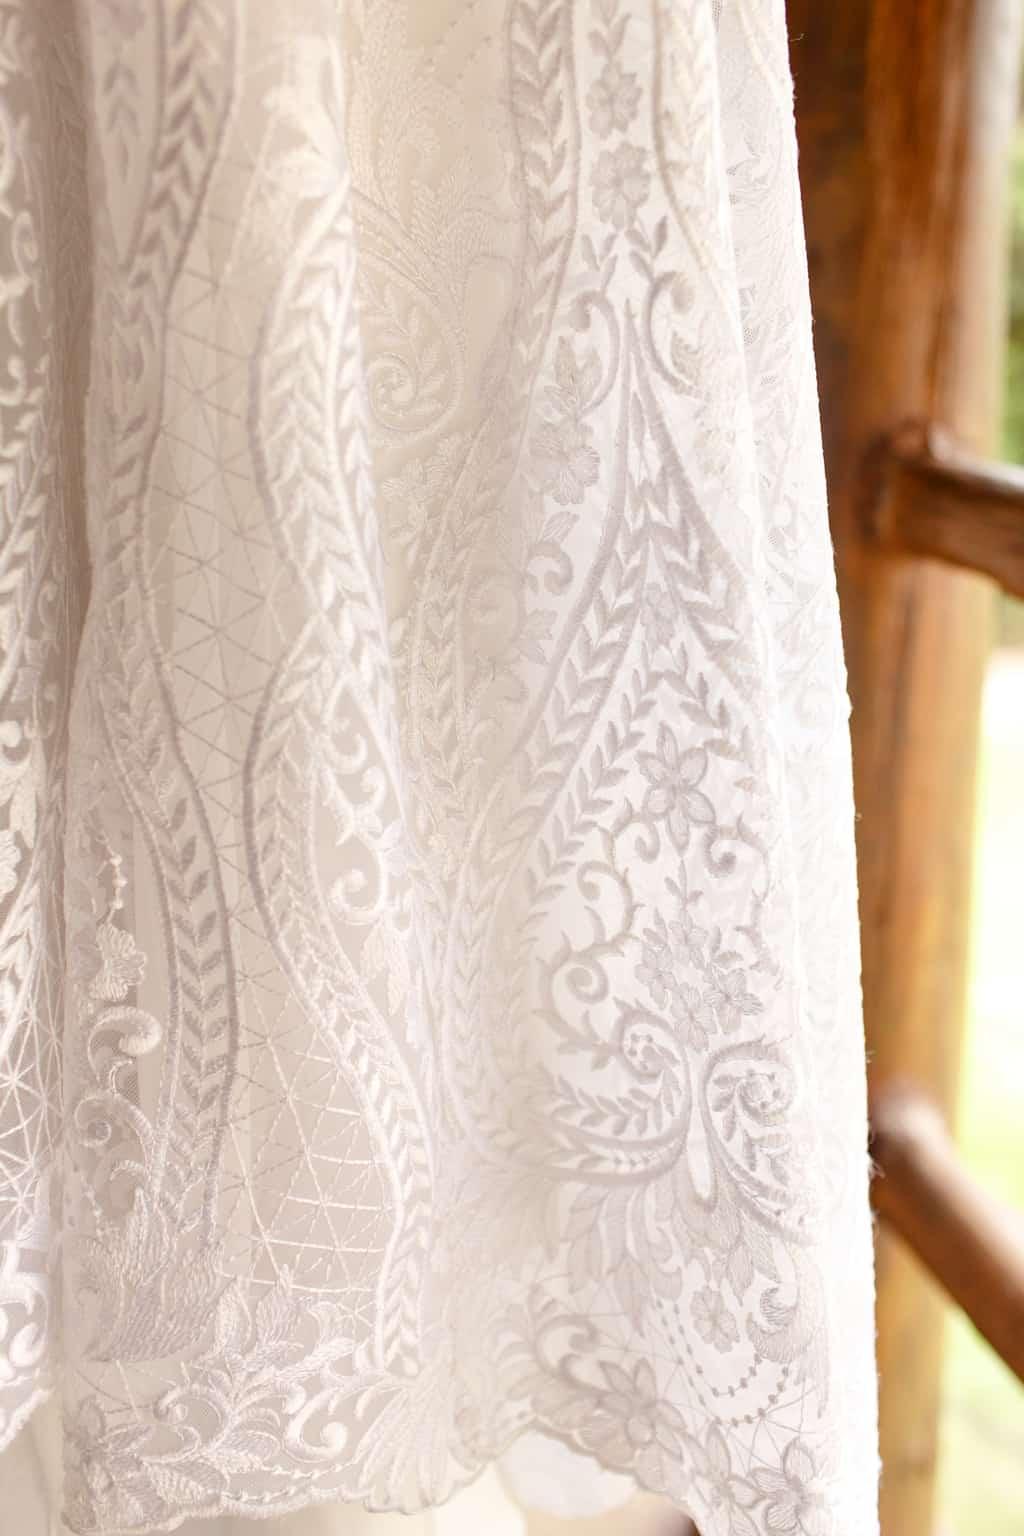 Casamento-Emanuelle-e-Alysson-Fotografia-Tadeu-Nanó-e-Luca-Antunes-230